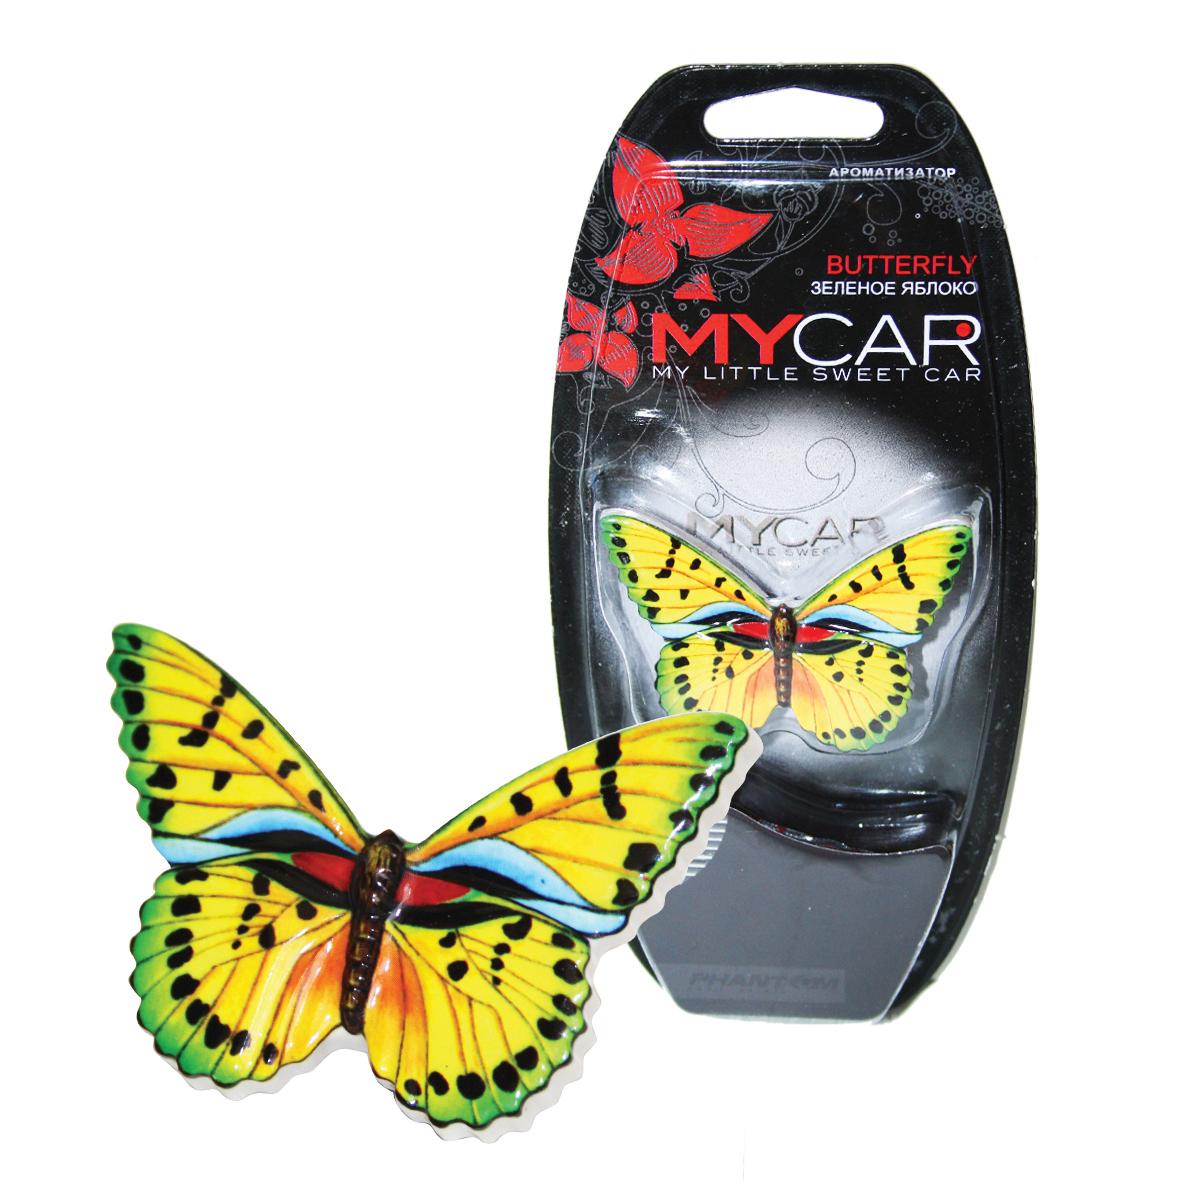 My car рн3207 butterfly 220 Вольт 109.000